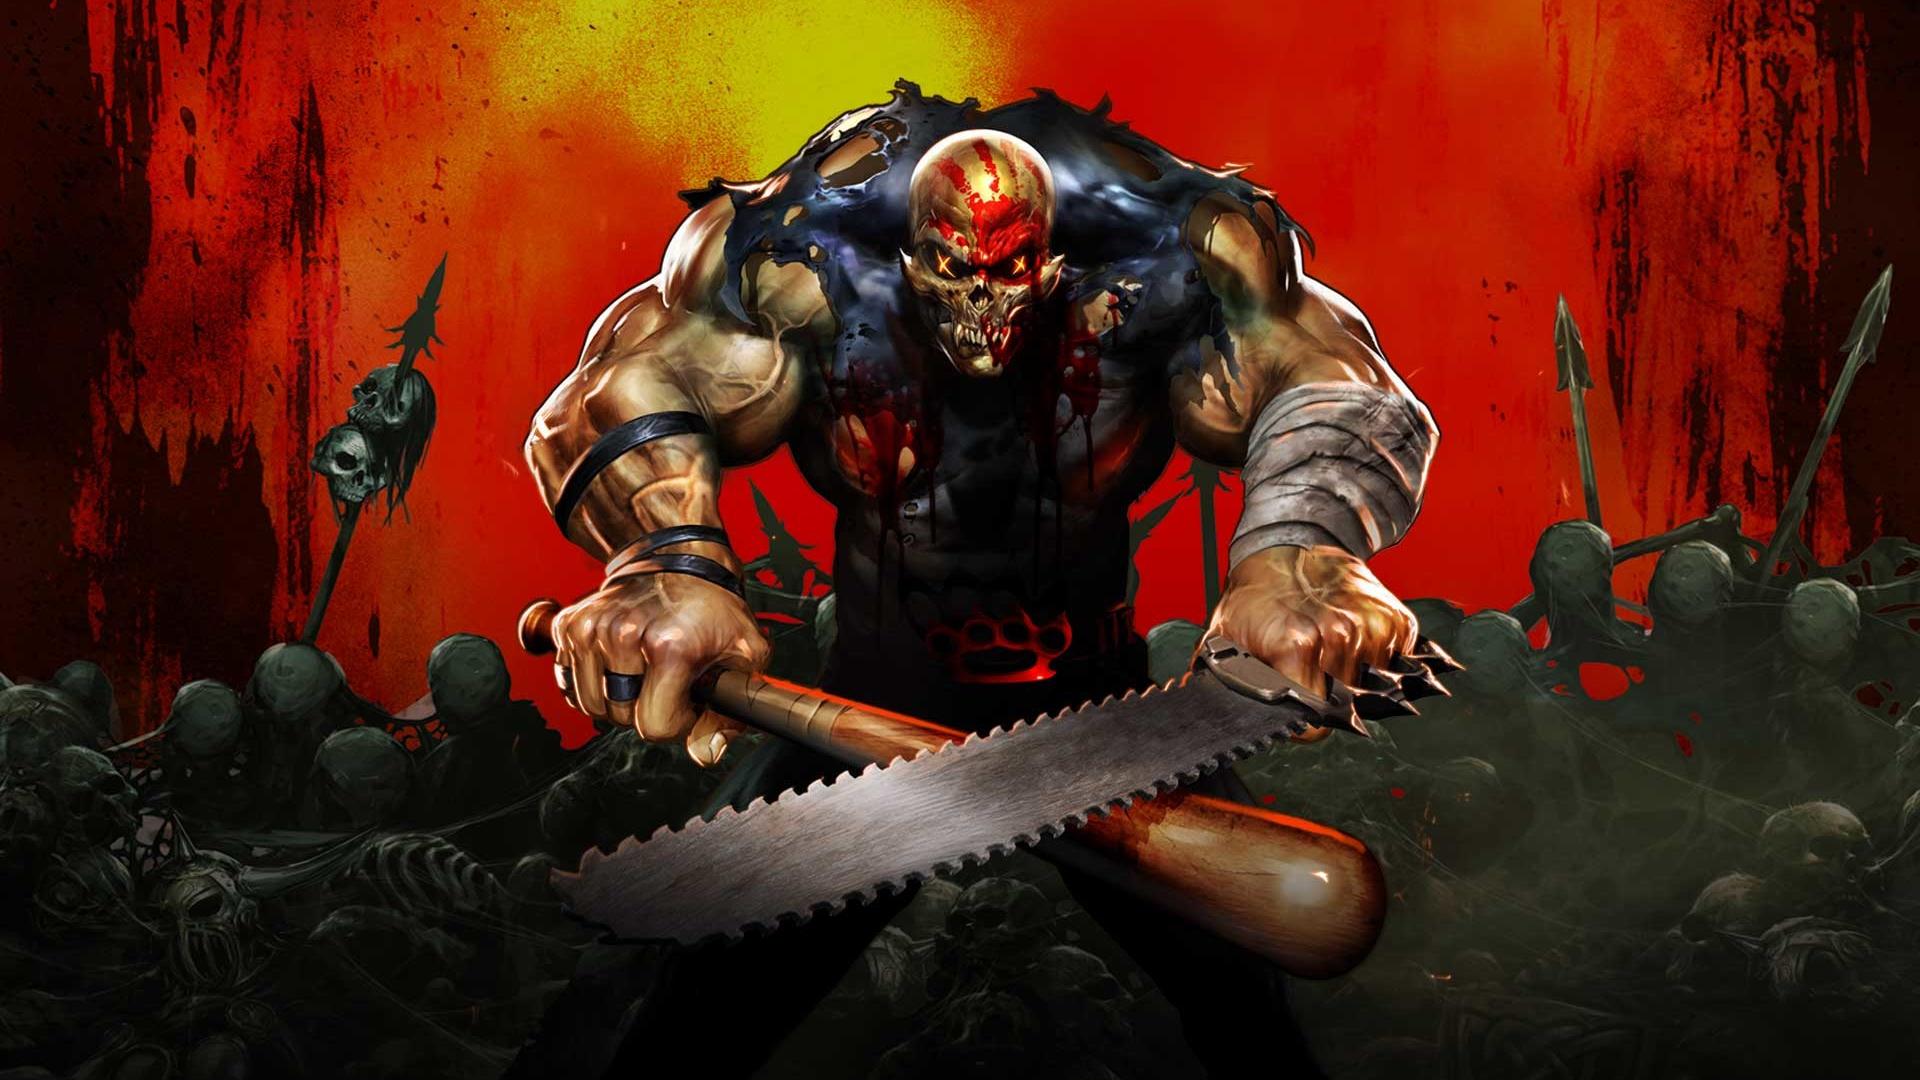 Free Download Wallpaper Five Finger Death Punch 78 Images